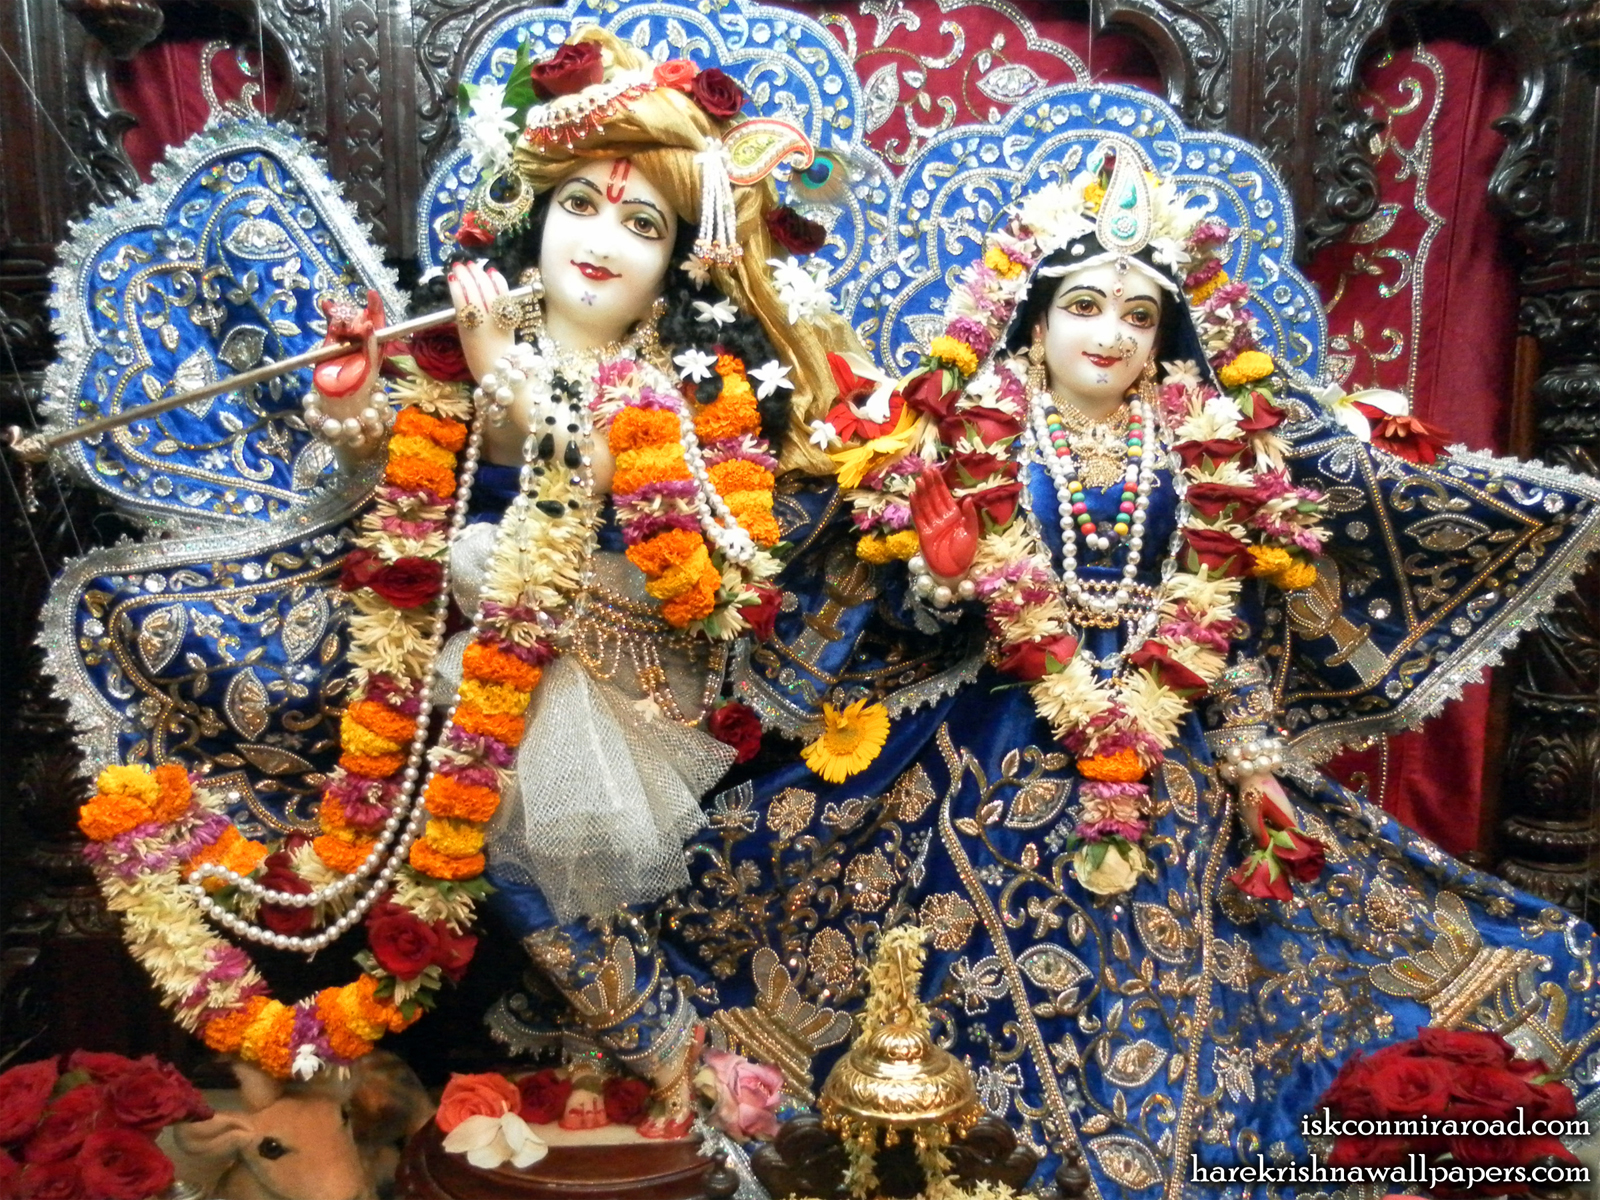 Sri Sri Radha Giridhari Wallpaper (008) Size1600x1200 Download